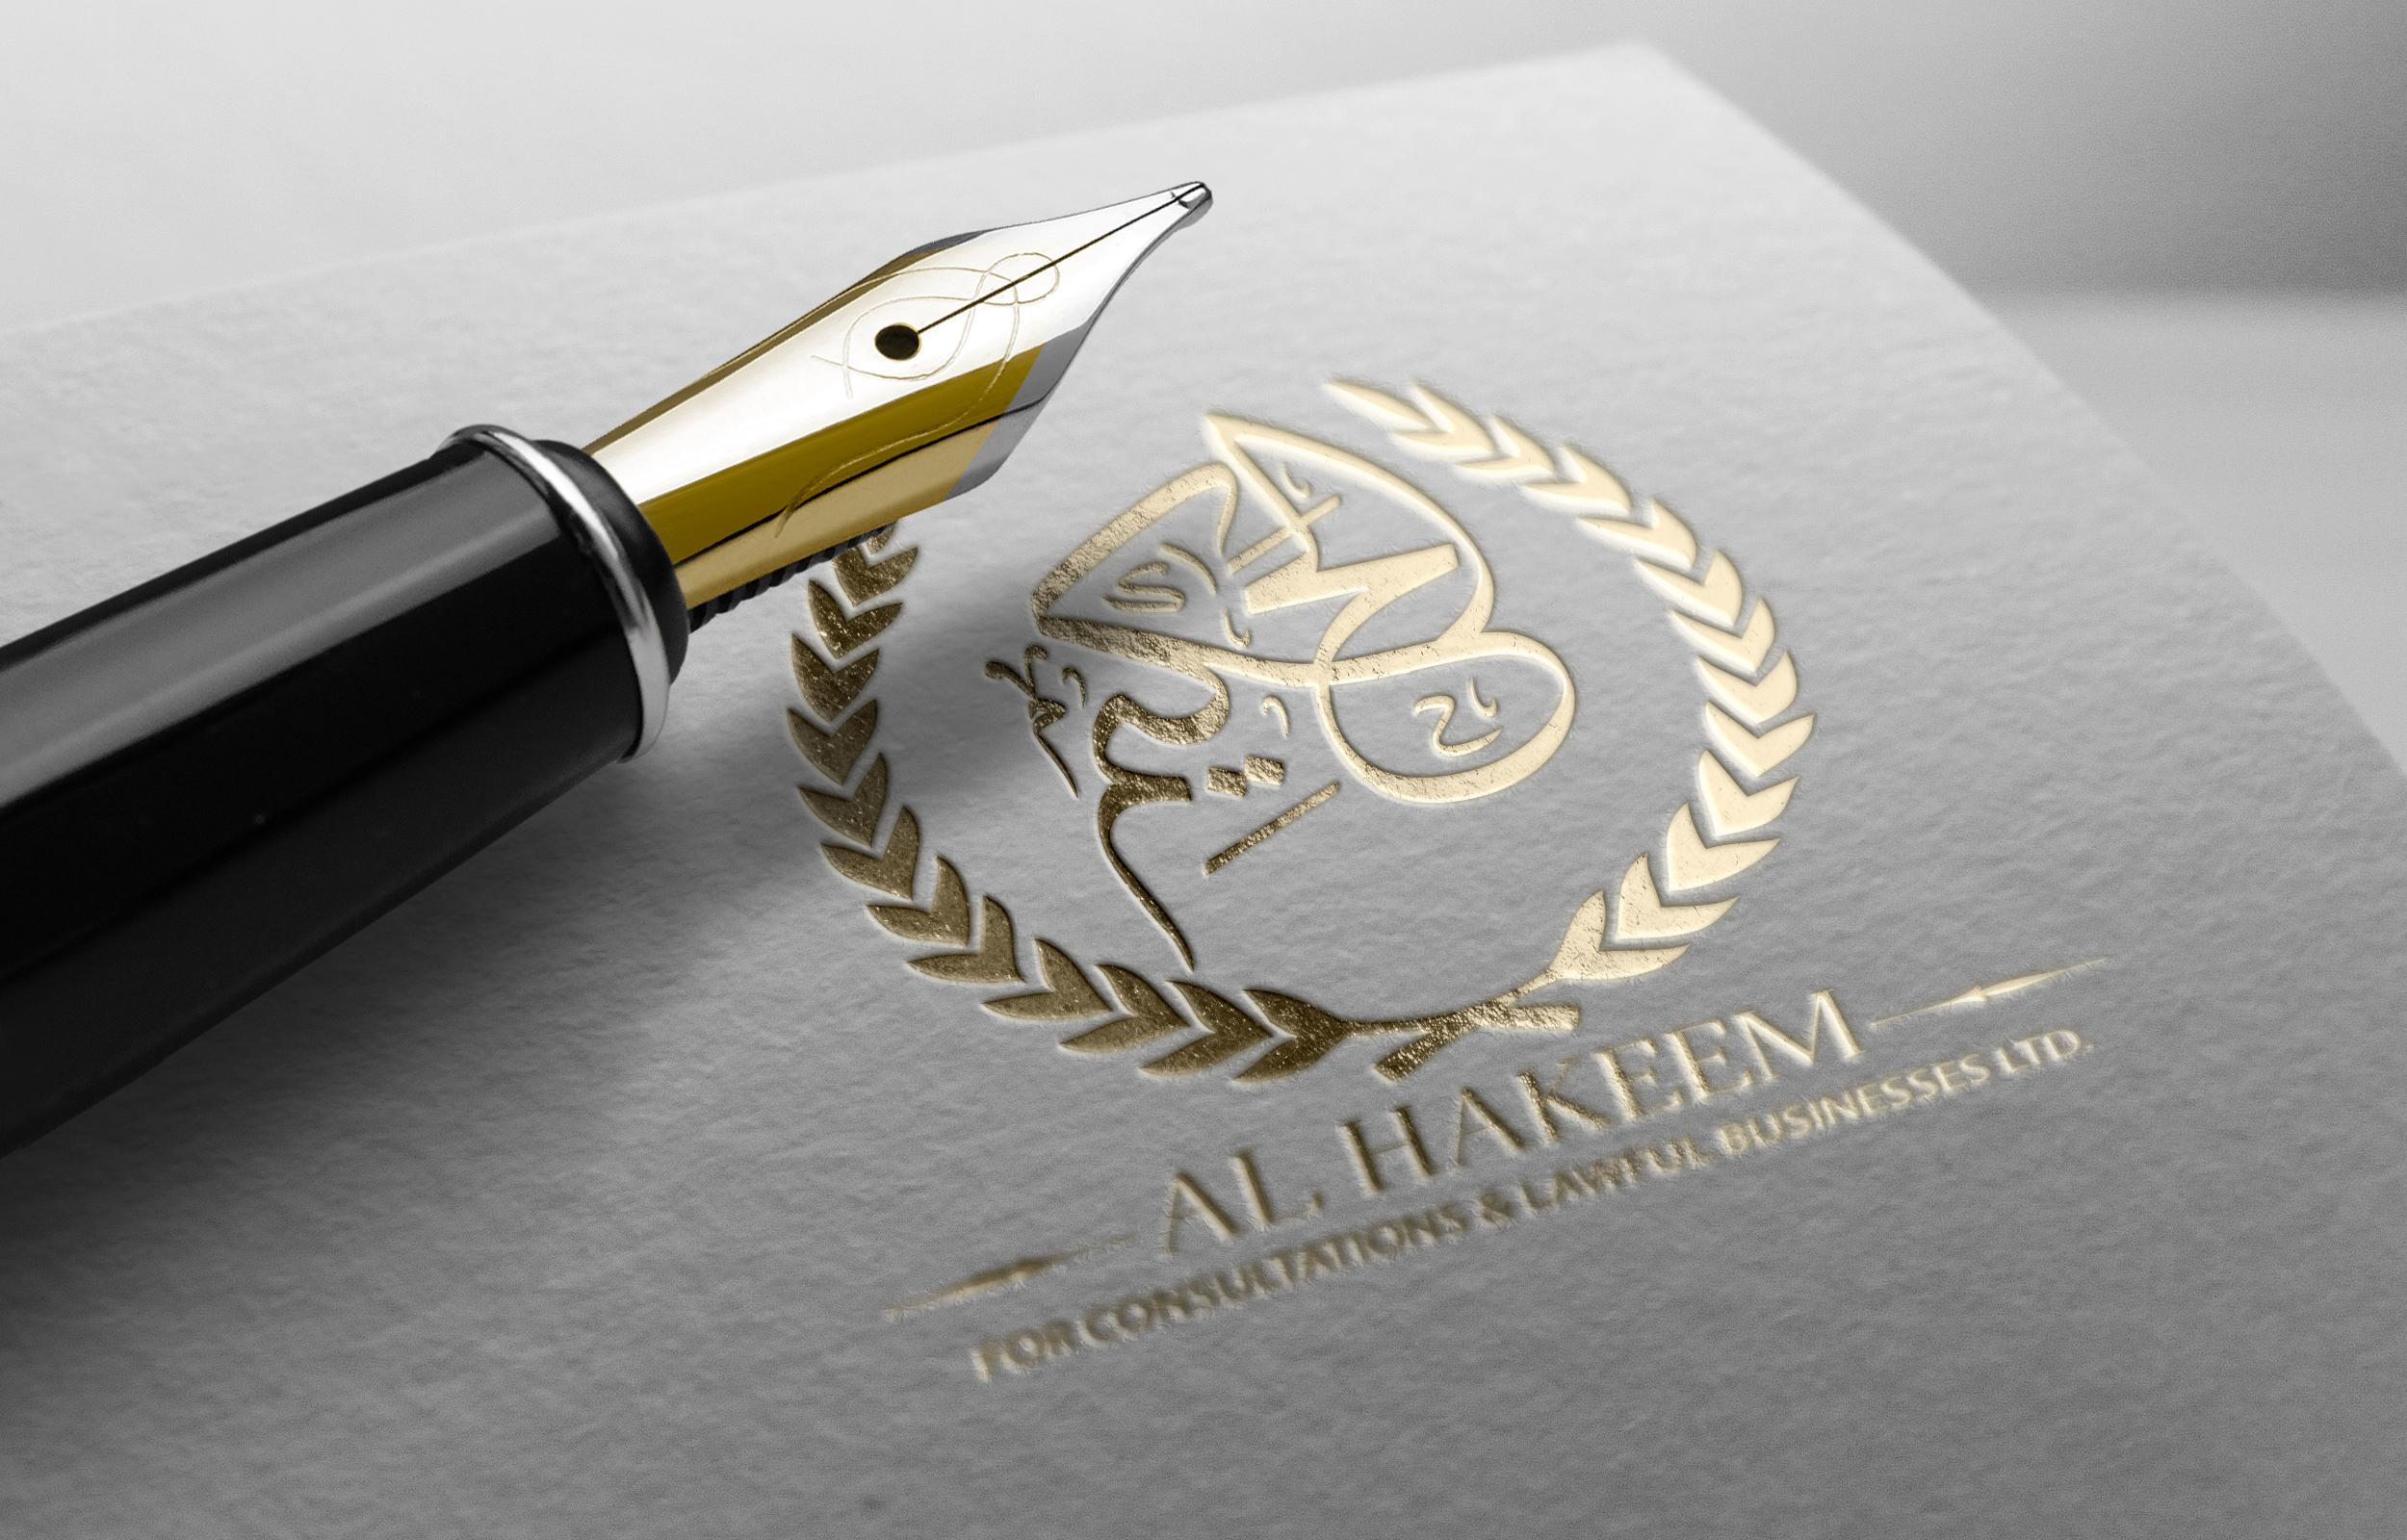 Al Hakeem white